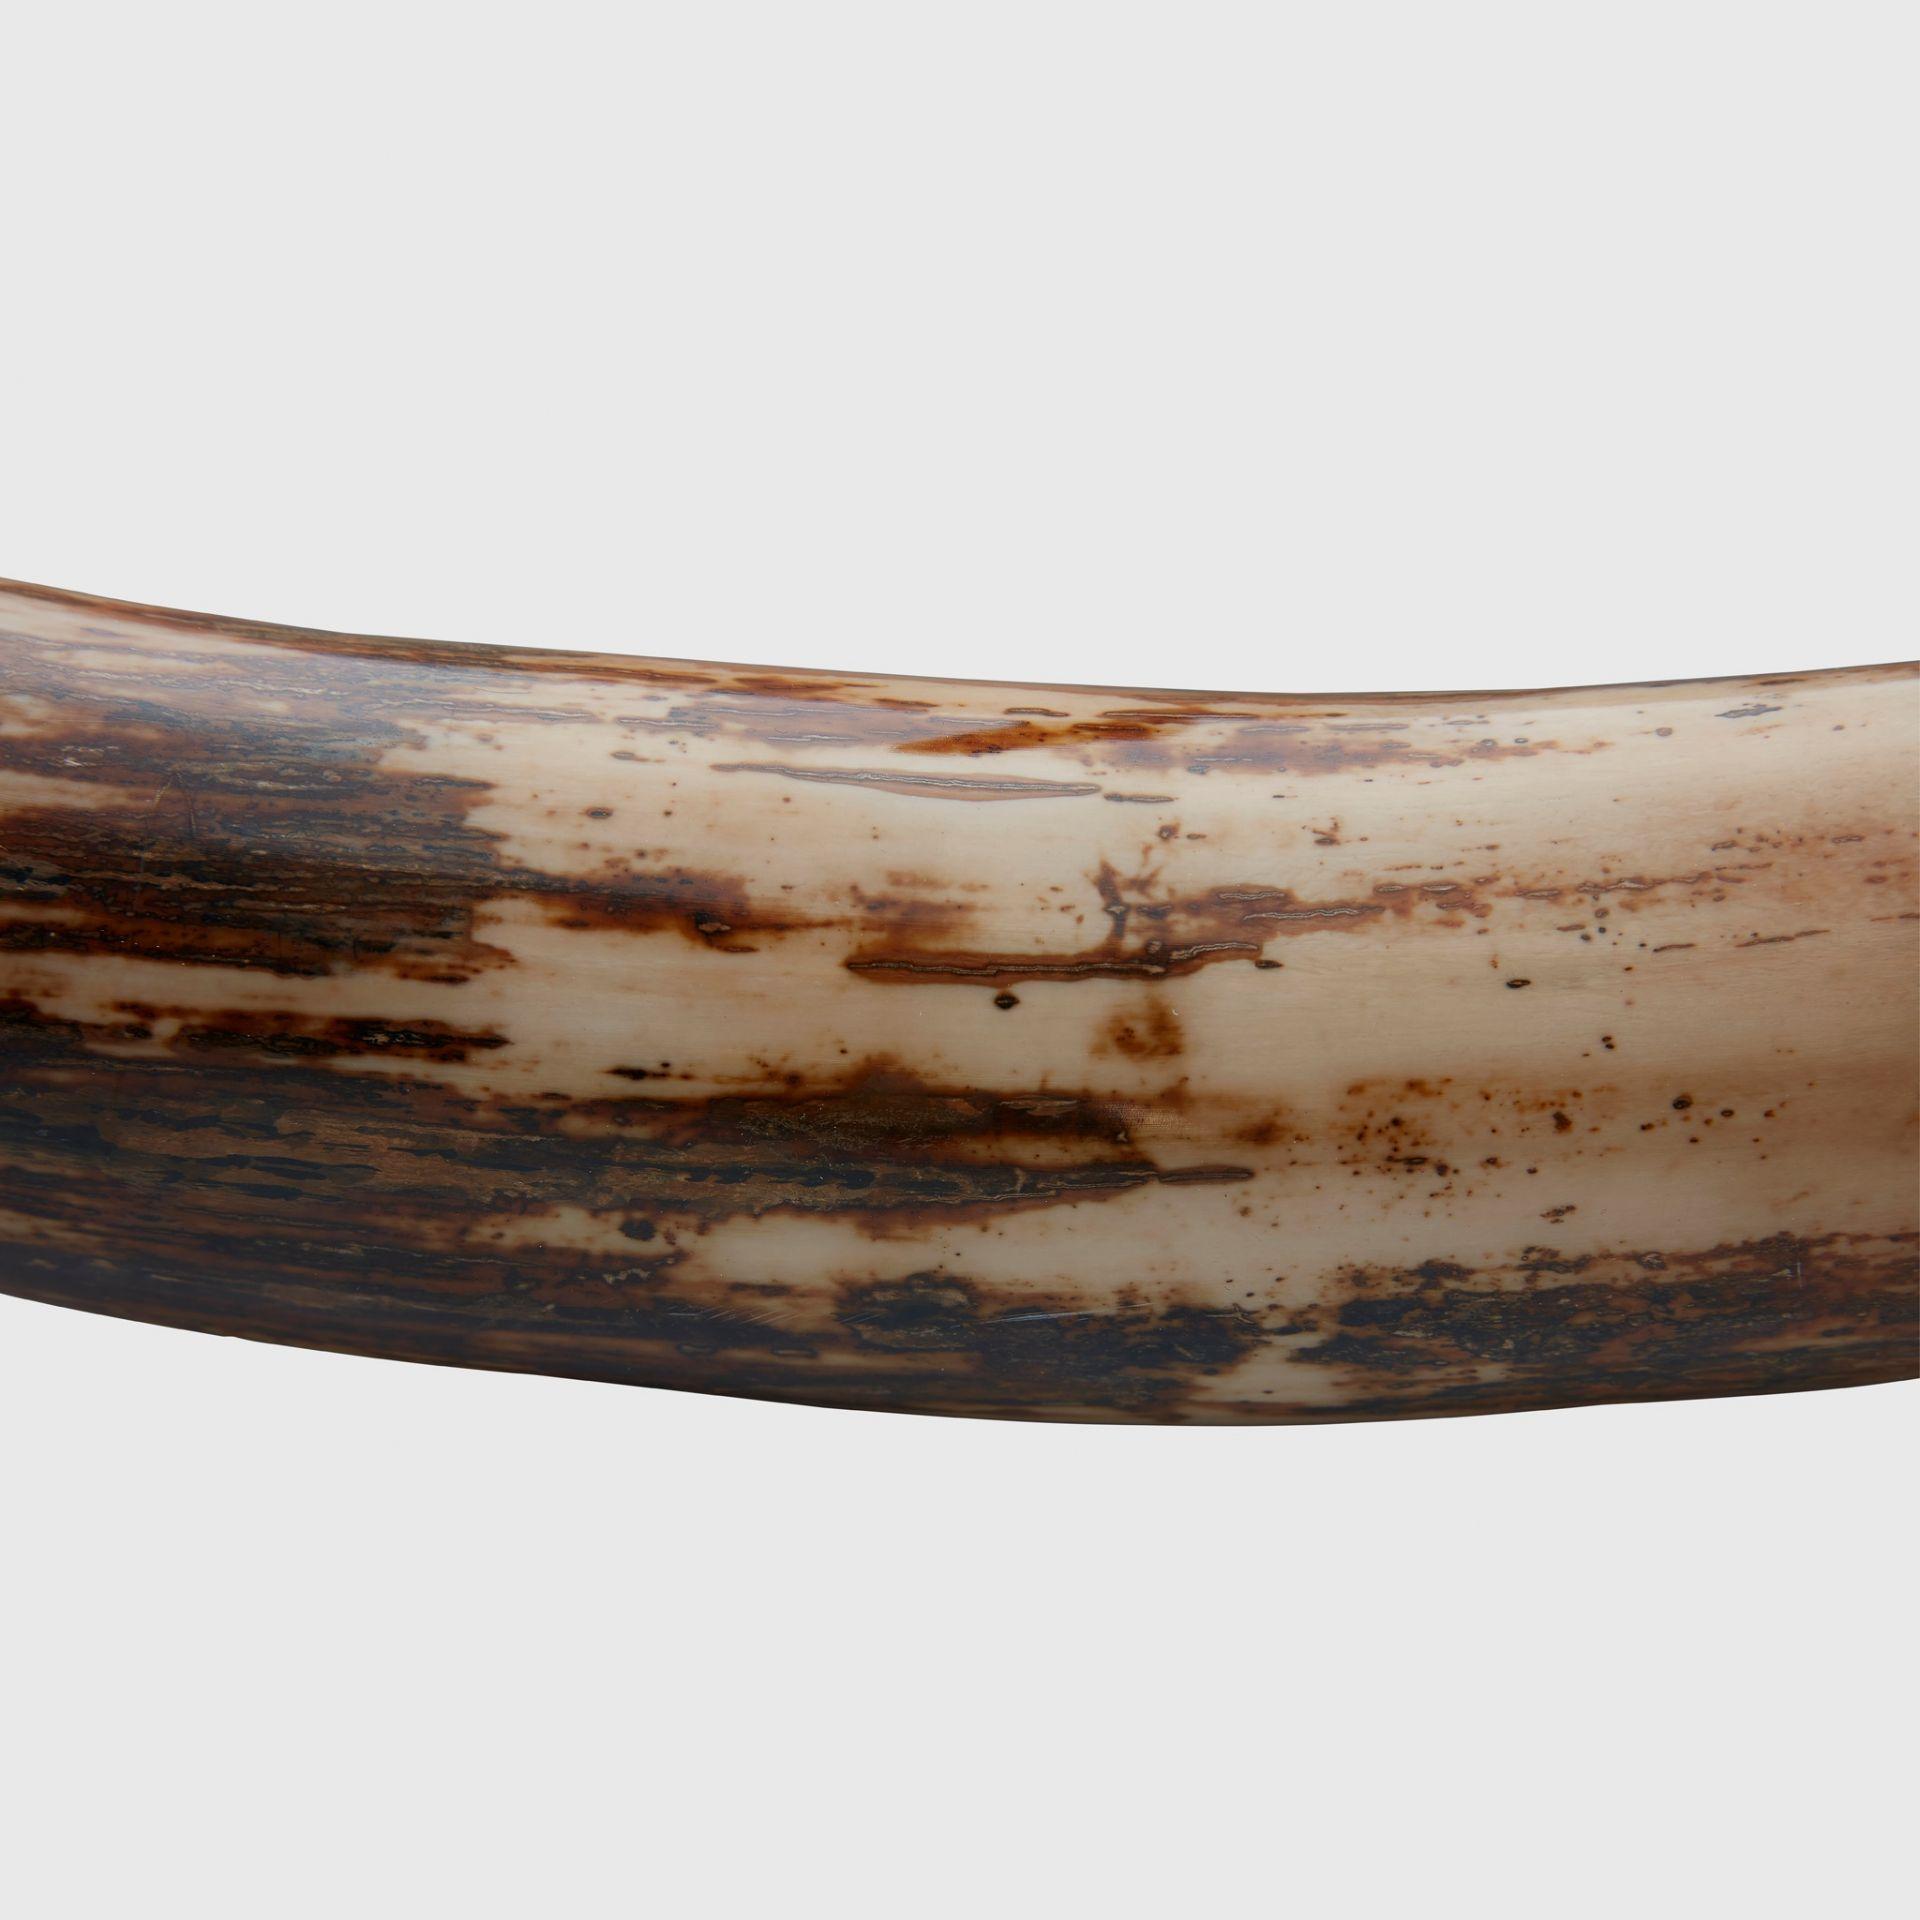 LARGE WOOLLY MAMMOTH TUSK, MAMMUTHUS PRIMIGENIUS SIBERIA, PLEISTOCENE C. 80,000 - 10,000 YEARS B.P. - Image 3 of 5